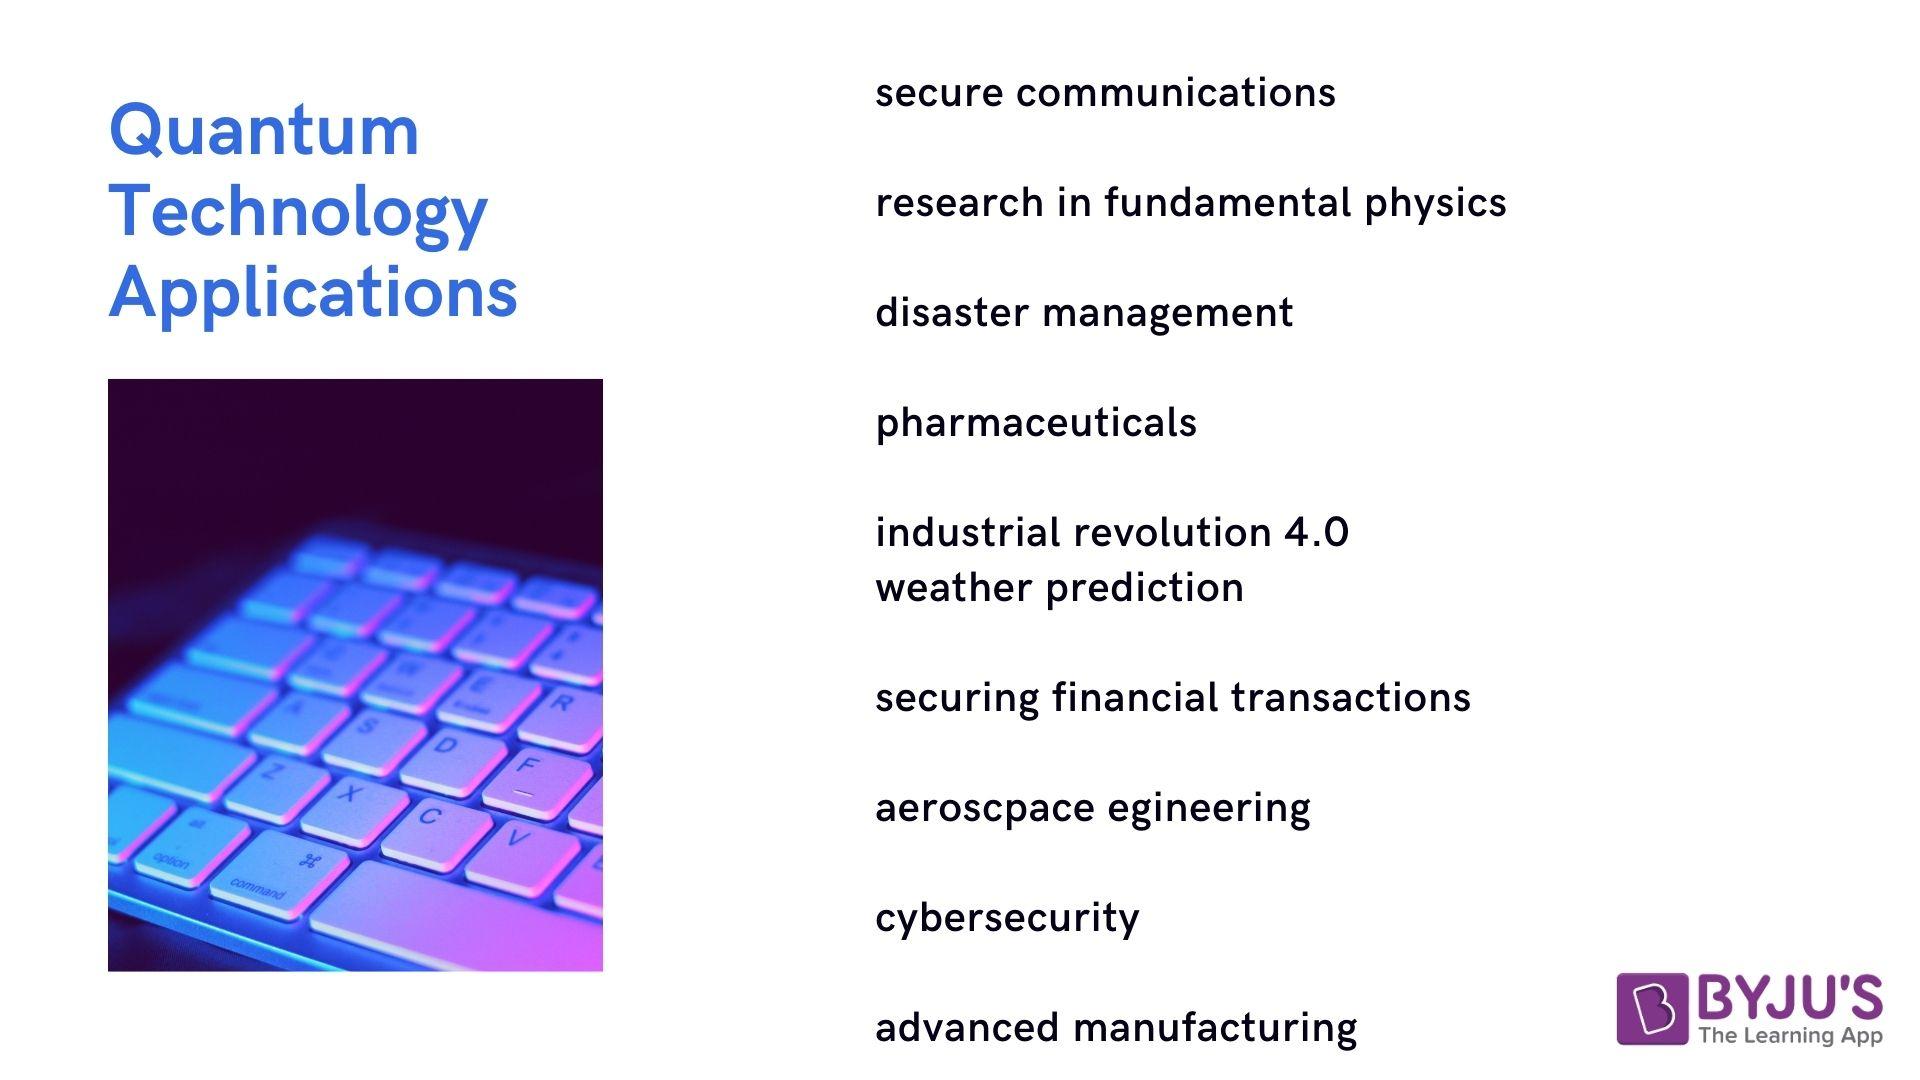 Applications of Quantum Technology